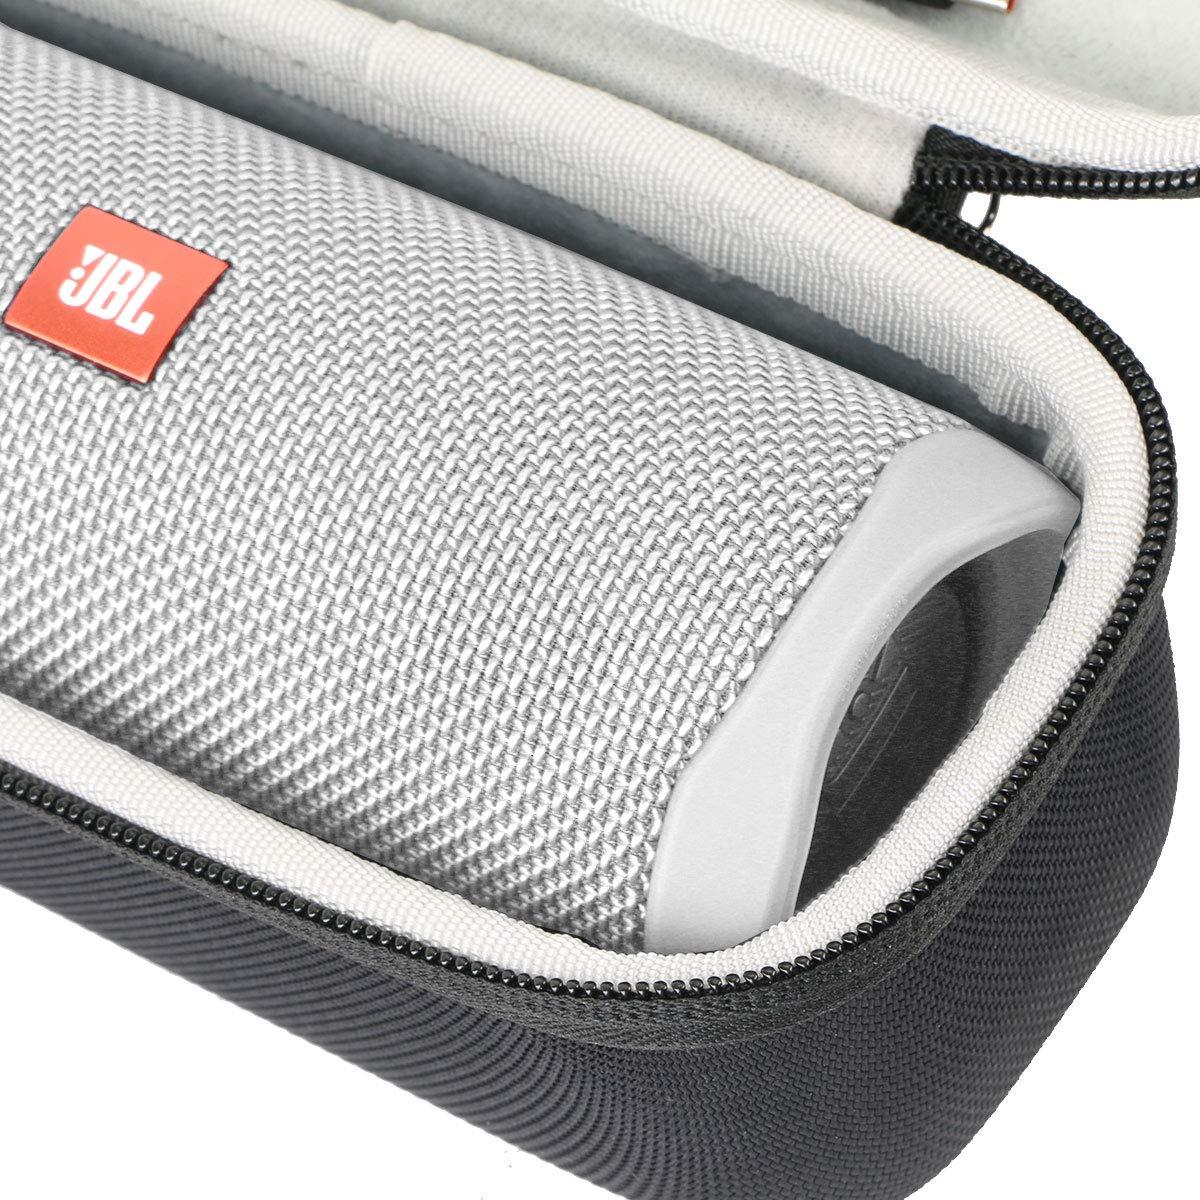 Khanka Hard Travel Case Replacement for JBL FLIP5 Flip 5 Waterproof Portable Bluetooth Speaker Black